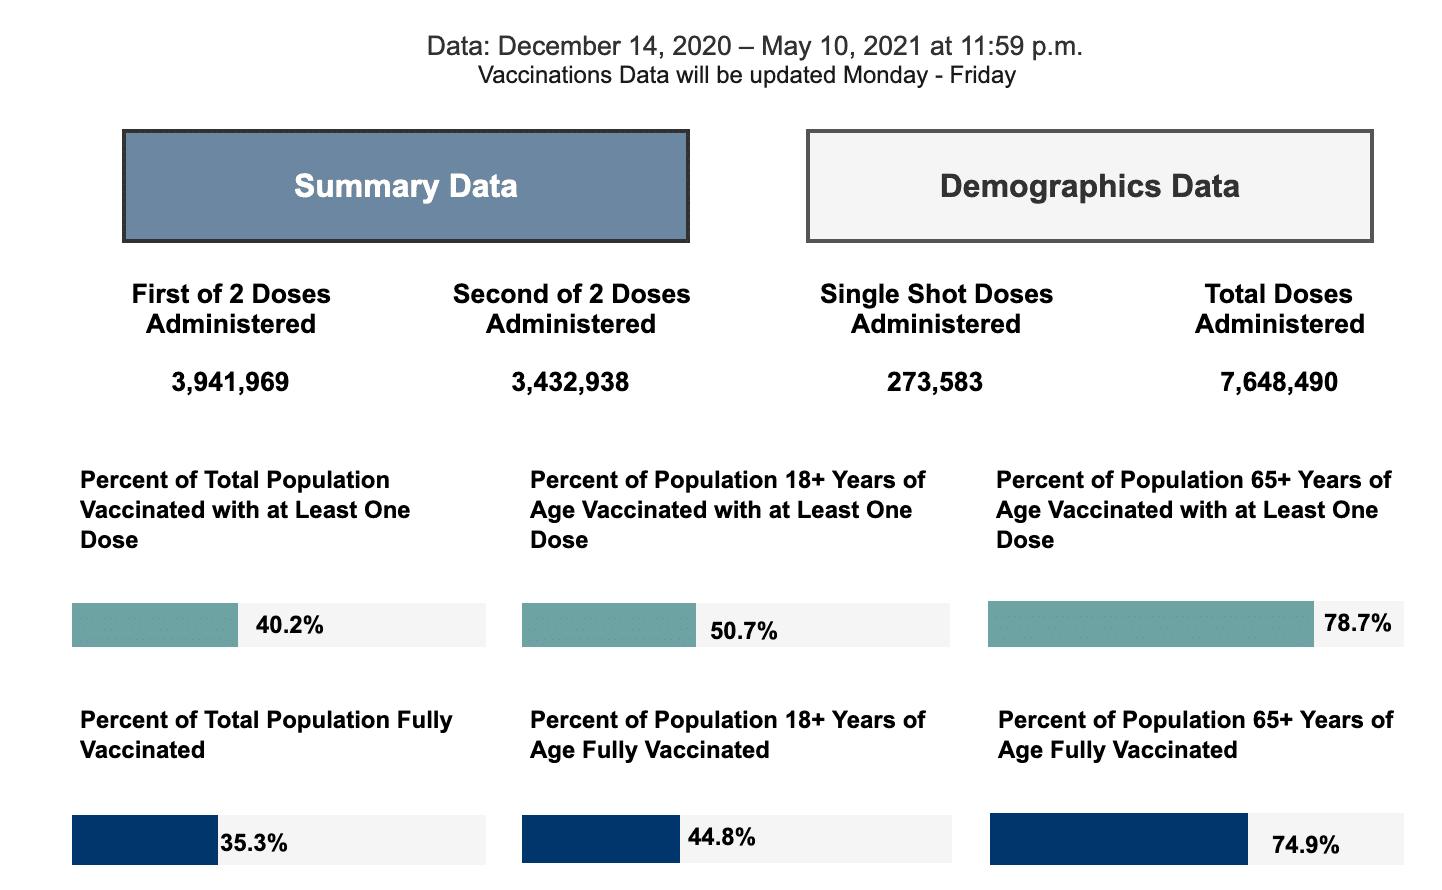 Tuesday May 11, 2021 - Appalachian State, Watauga, Alleghany, Ashe COVID-19 Cases & Vaccine Data